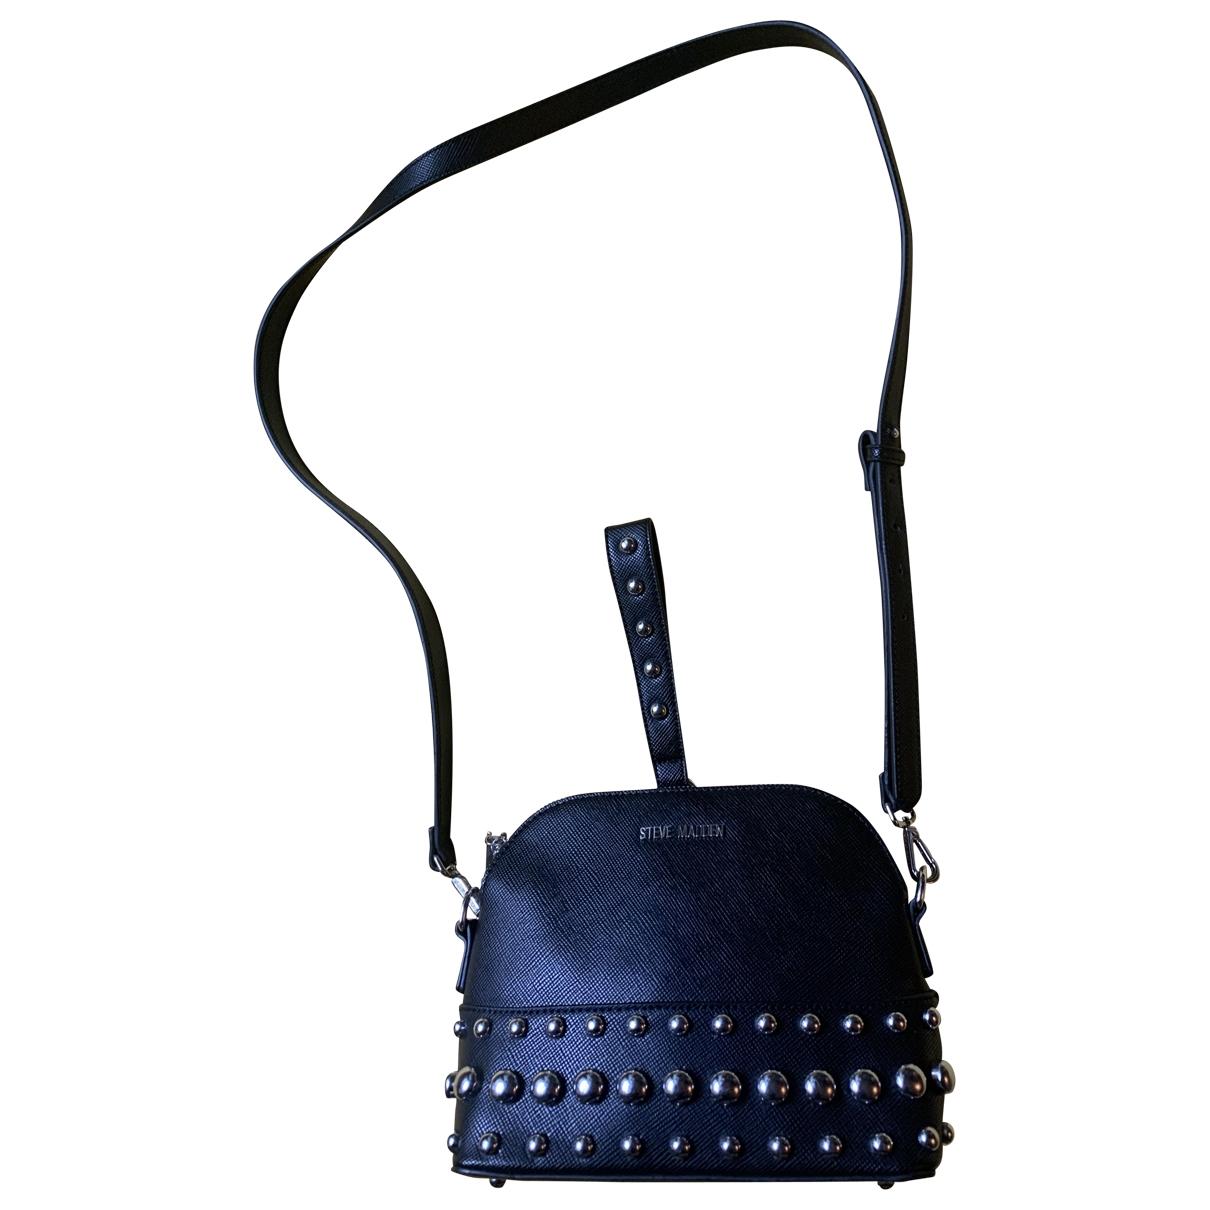 Steve Madden \N Handtasche in  Schwarz Leder